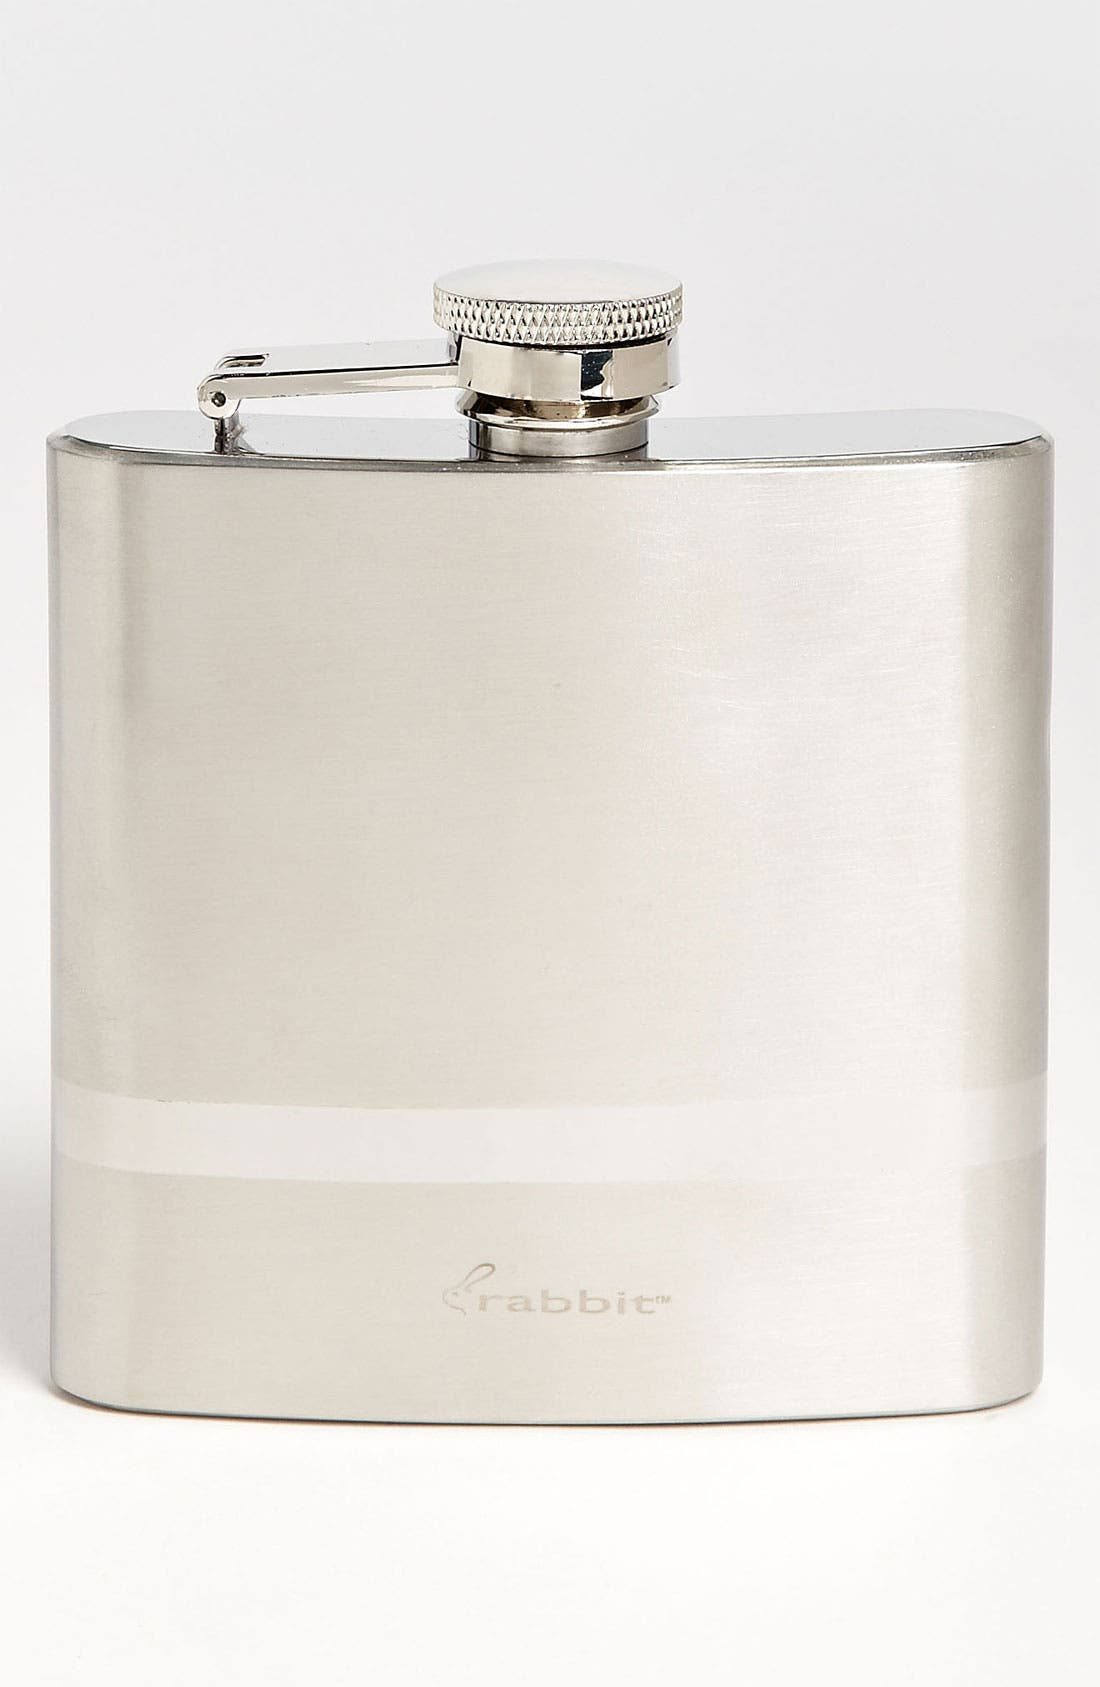 Main Image - Rabbit' Pocket Flask